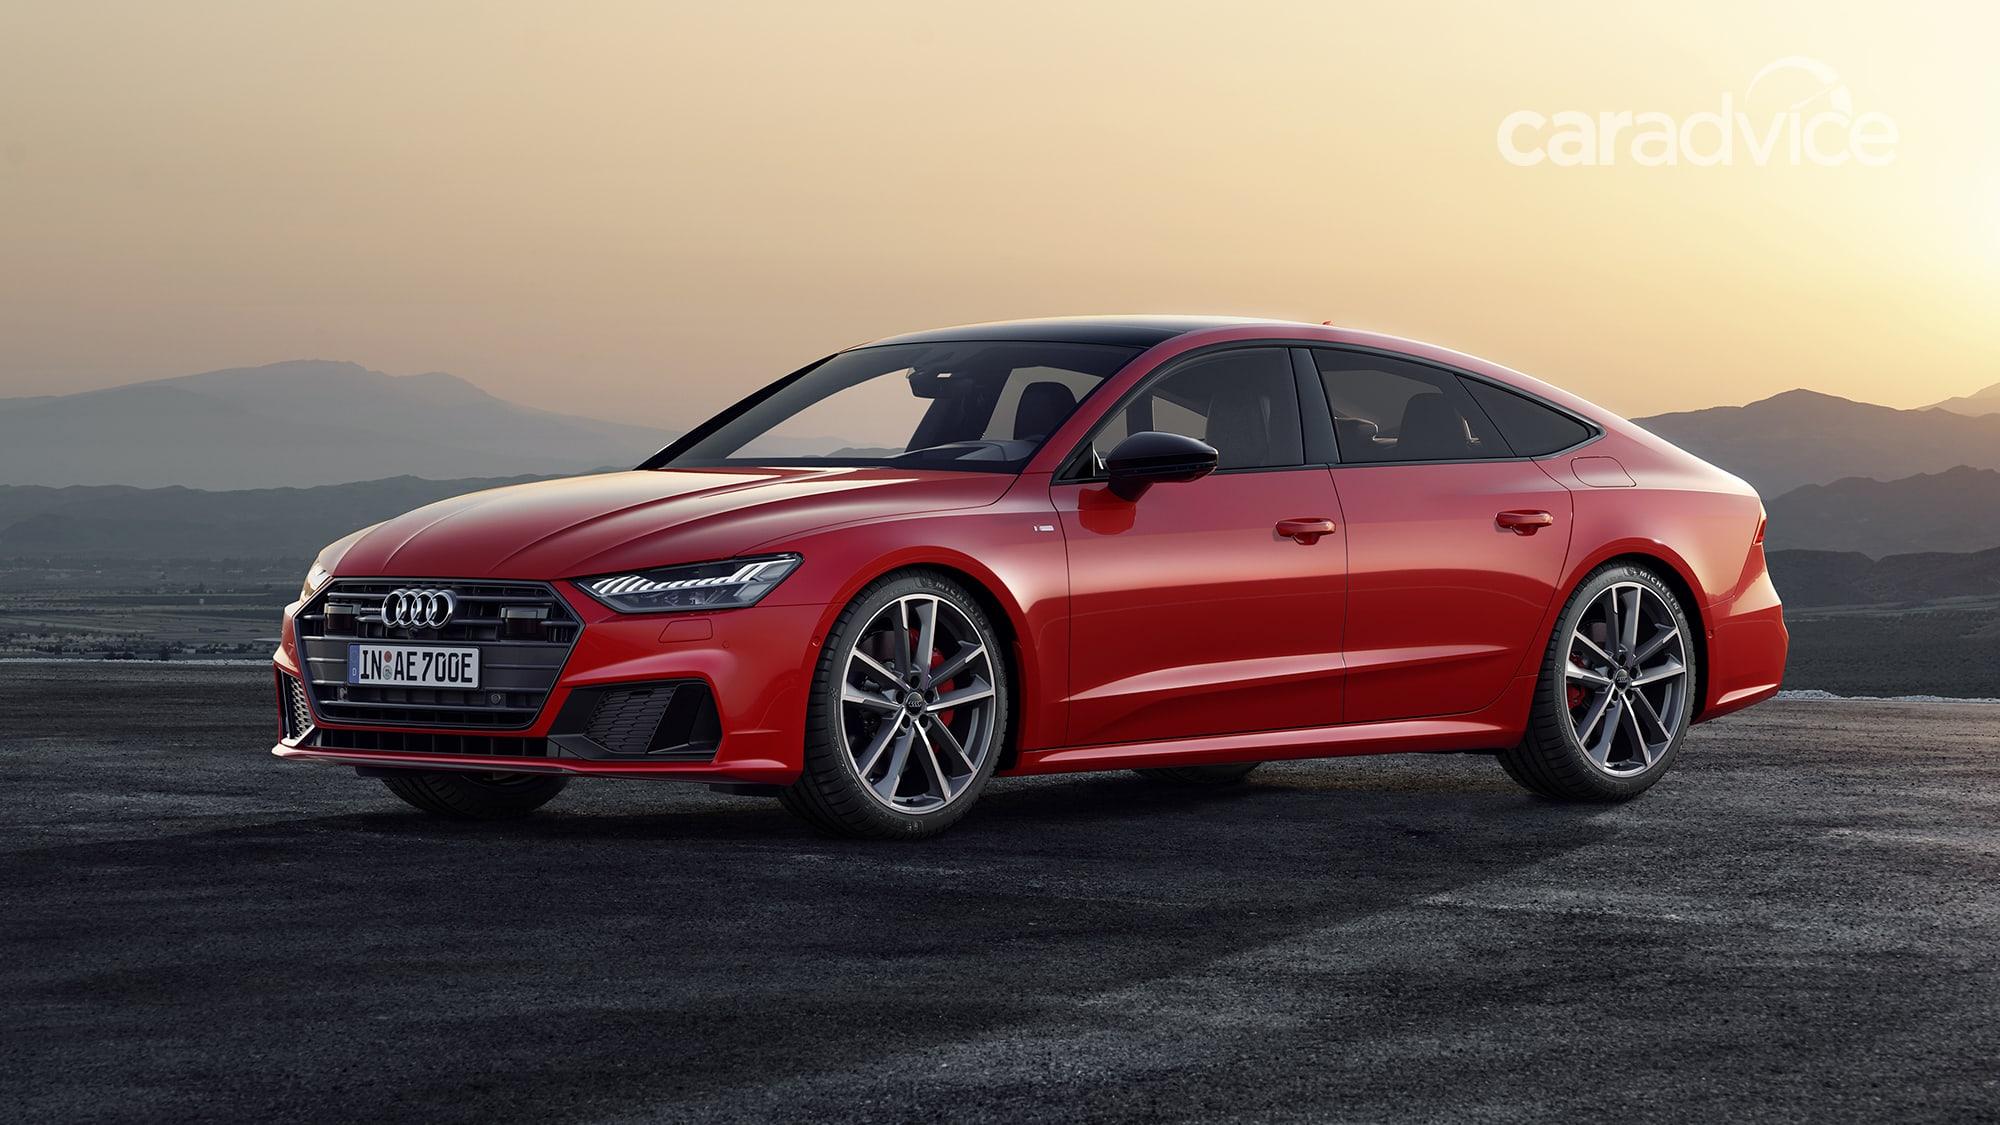 2020 Audi A7 Sportback 55 TFSI e quattro revealed   CarAdvice